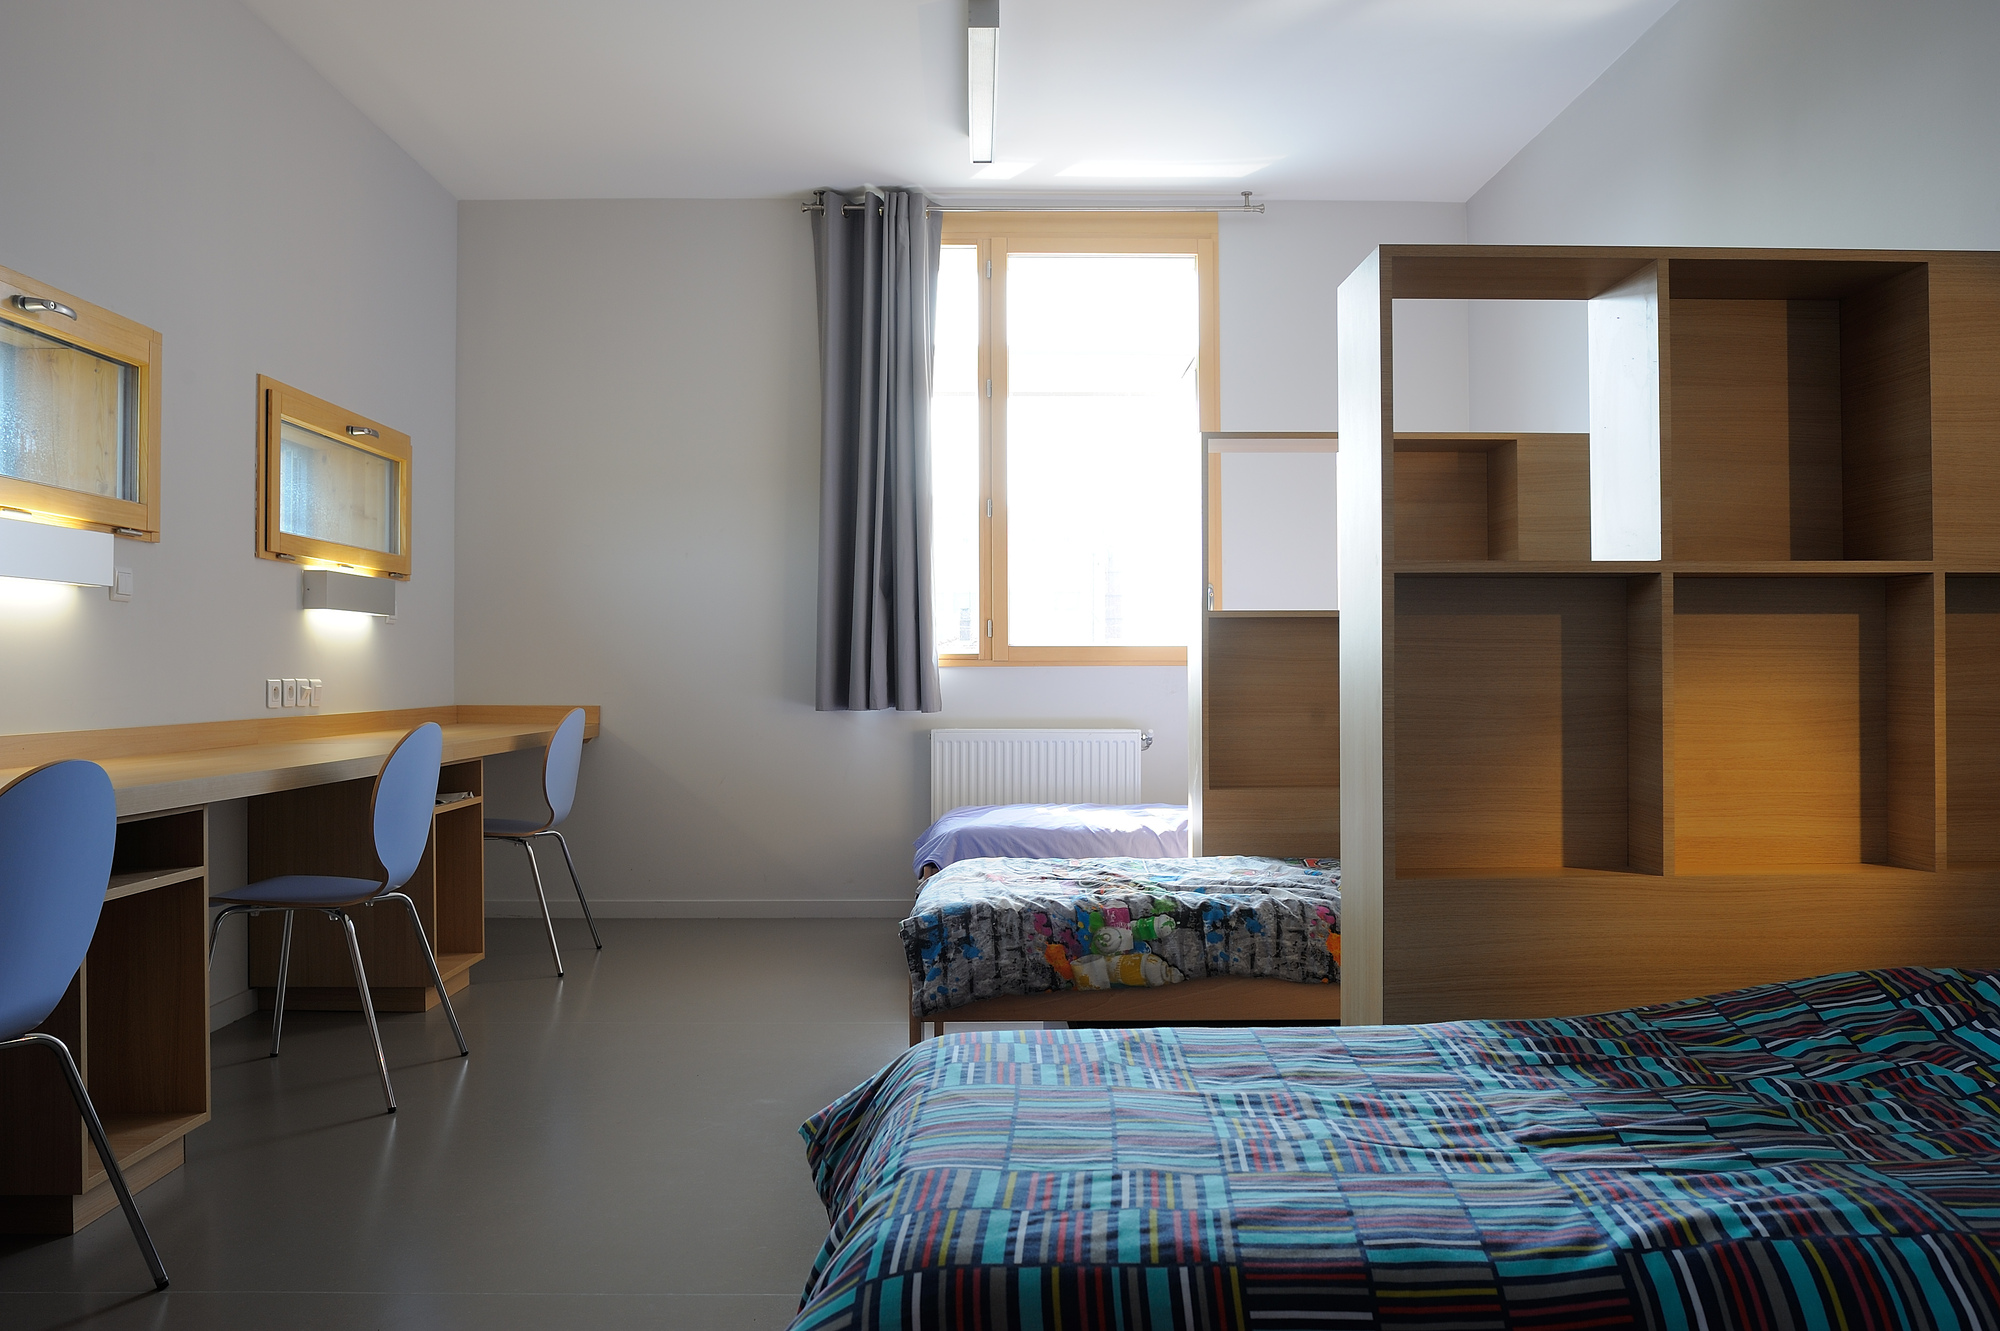 Loft Room House Share